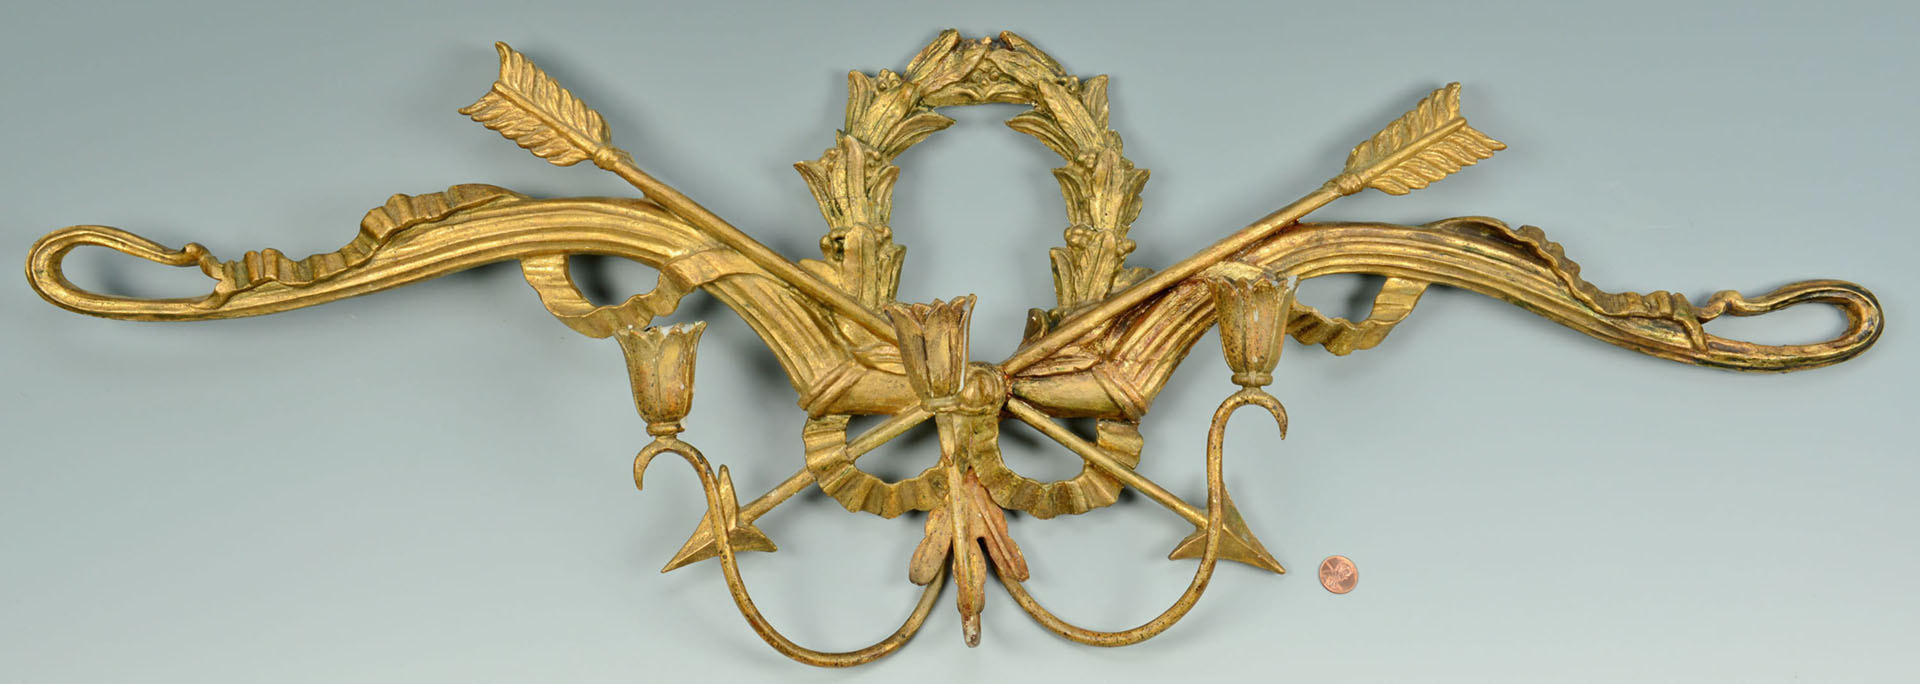 Lot 160: Palladio Italian Gilt Wood Sconce